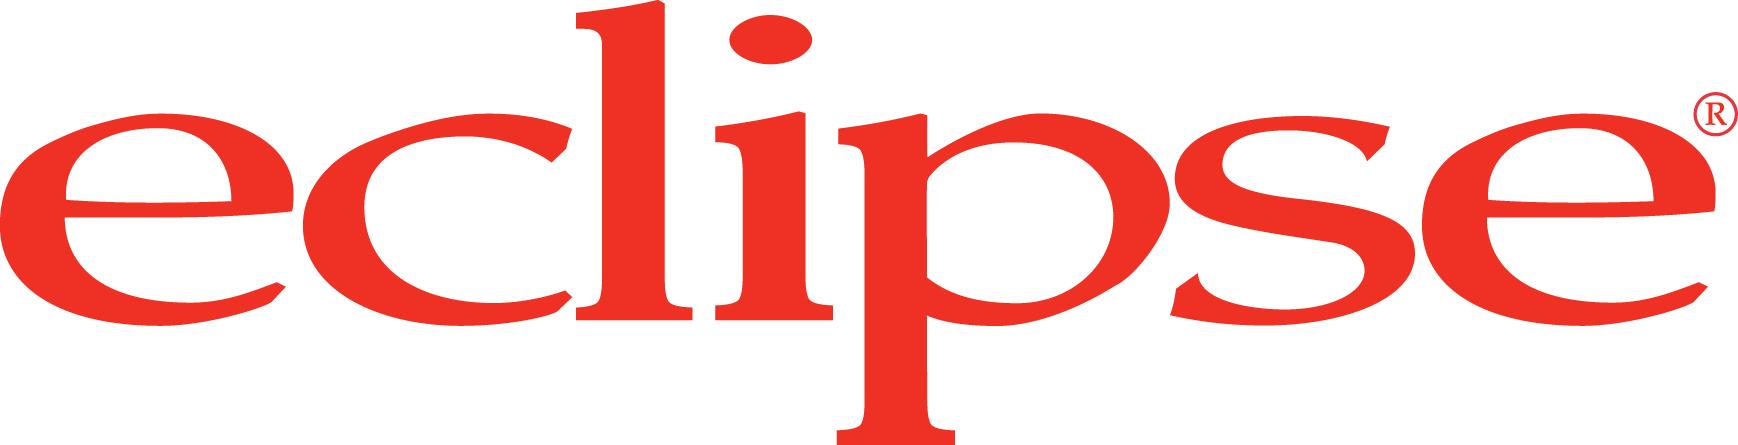 ECLIPSE_Logo_2012